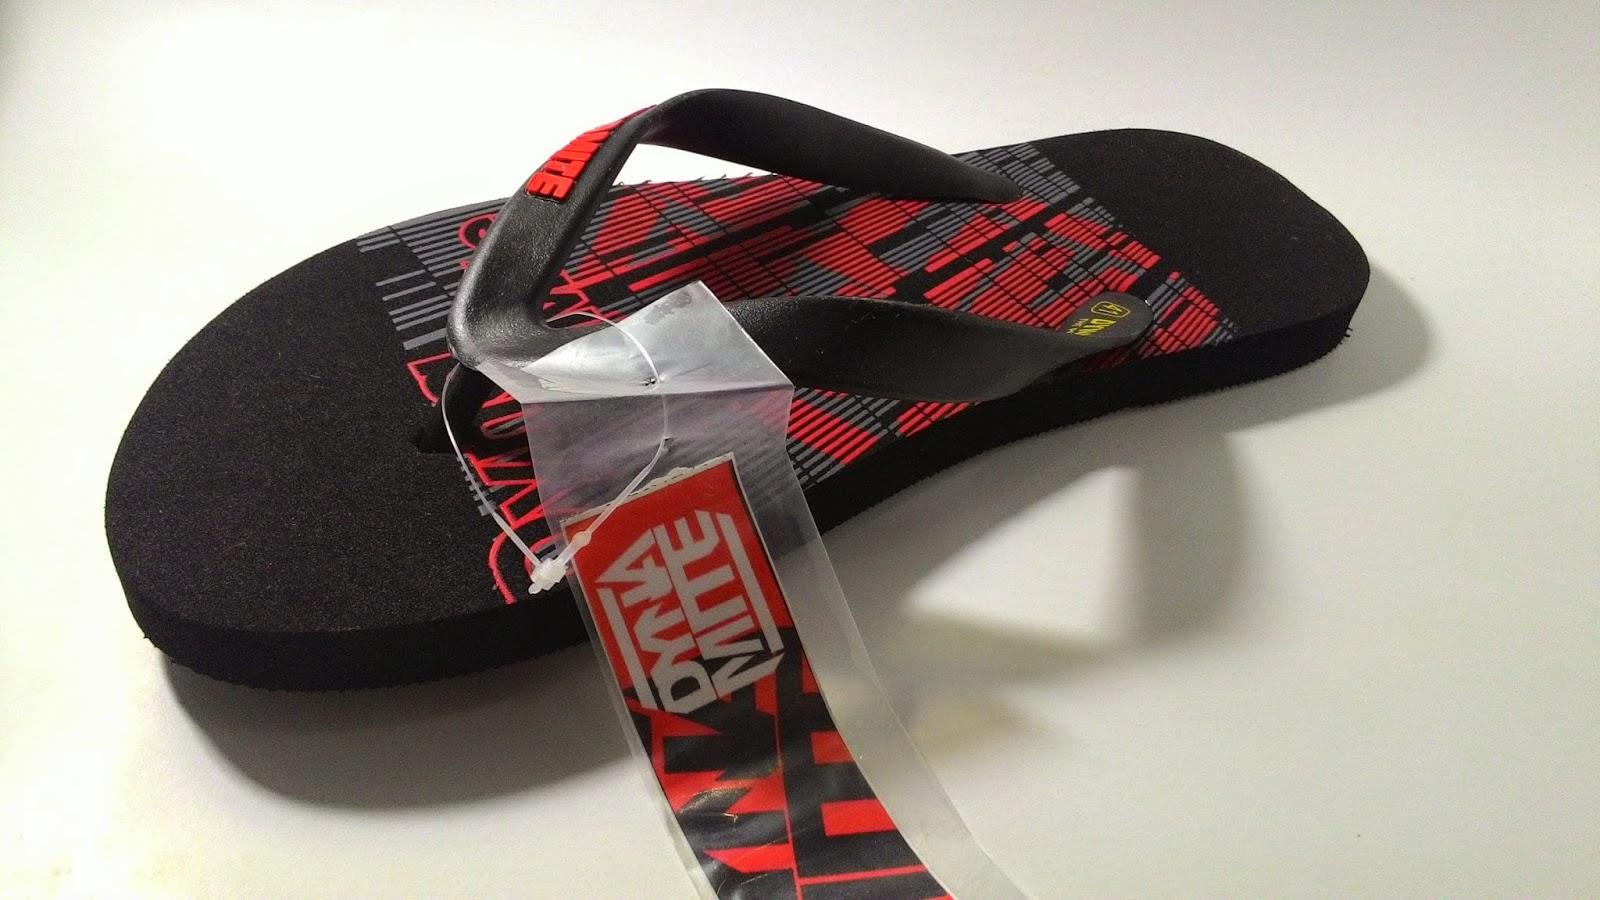 Model sandal distro untuk remaja masa kini terbaru